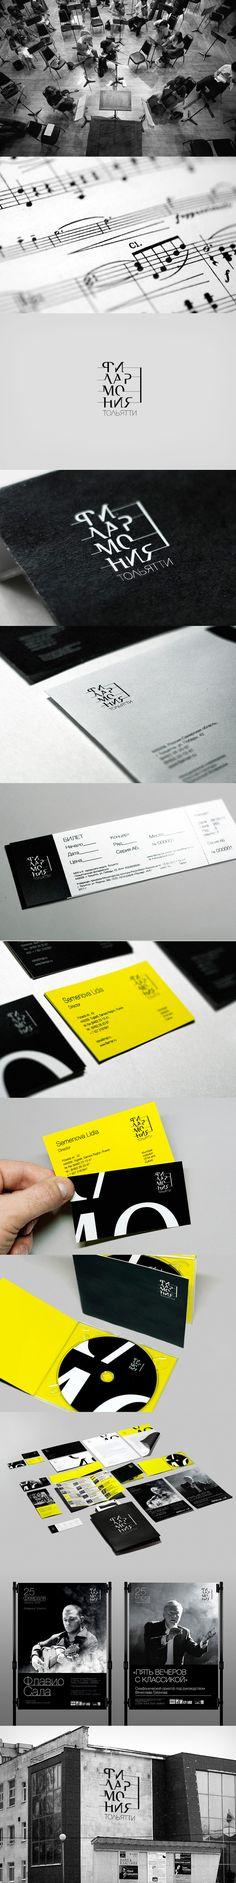 identity / Igor Hrupin